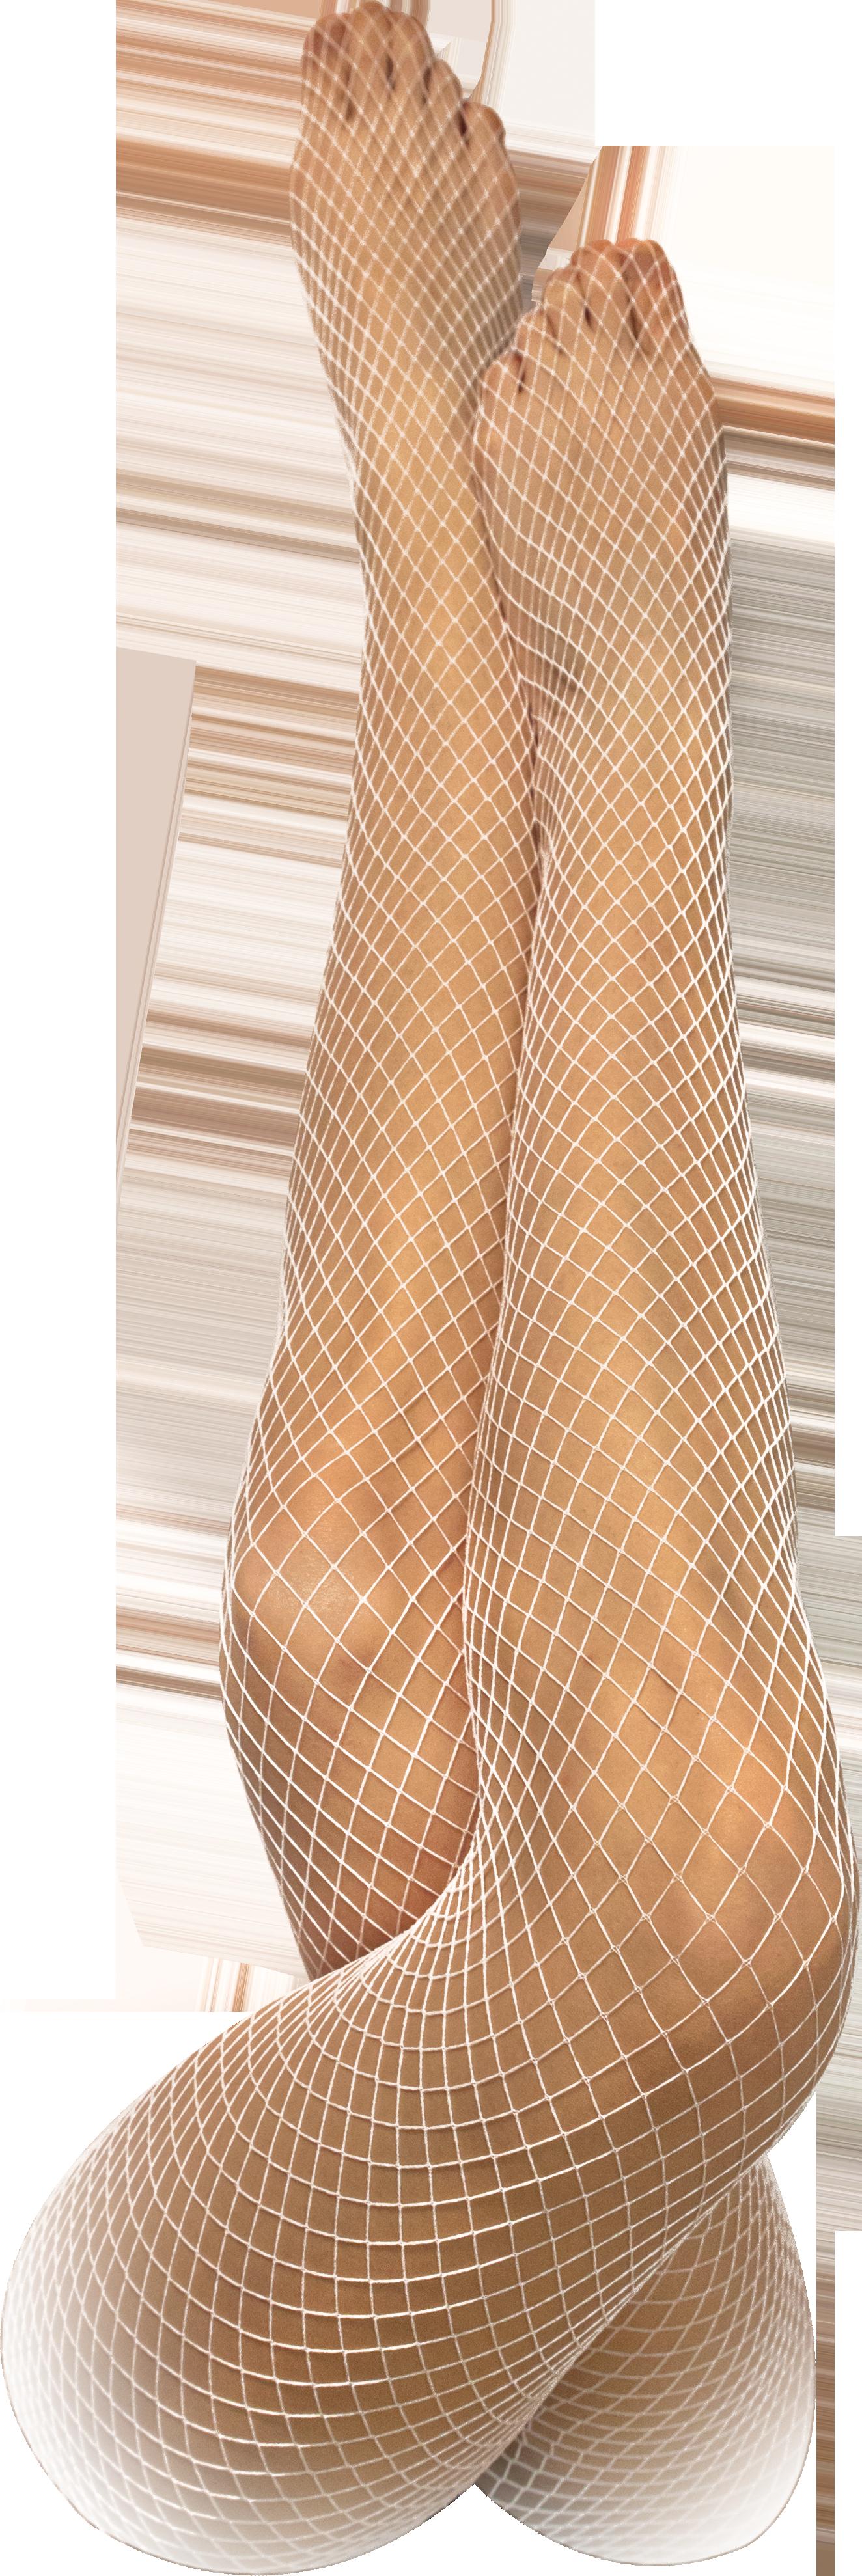 Netzstrumpfhose weiß